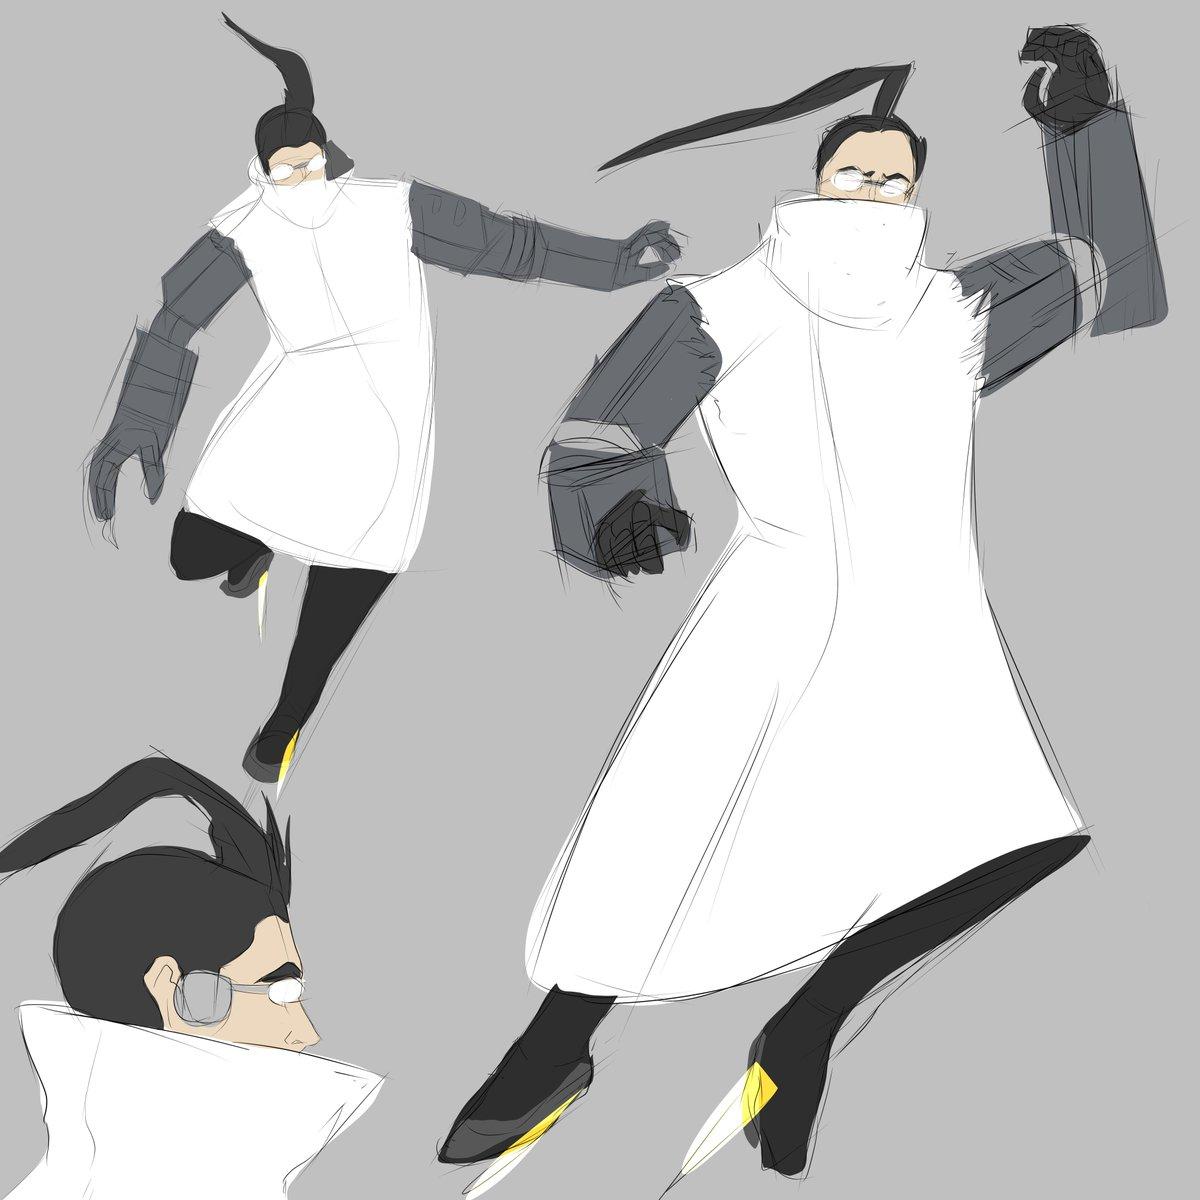 HES NOW IN COLOR #ProfessorMembrane #InvaderZim #EnterTheFlorpus https://t.co/cMuUq5UZp2